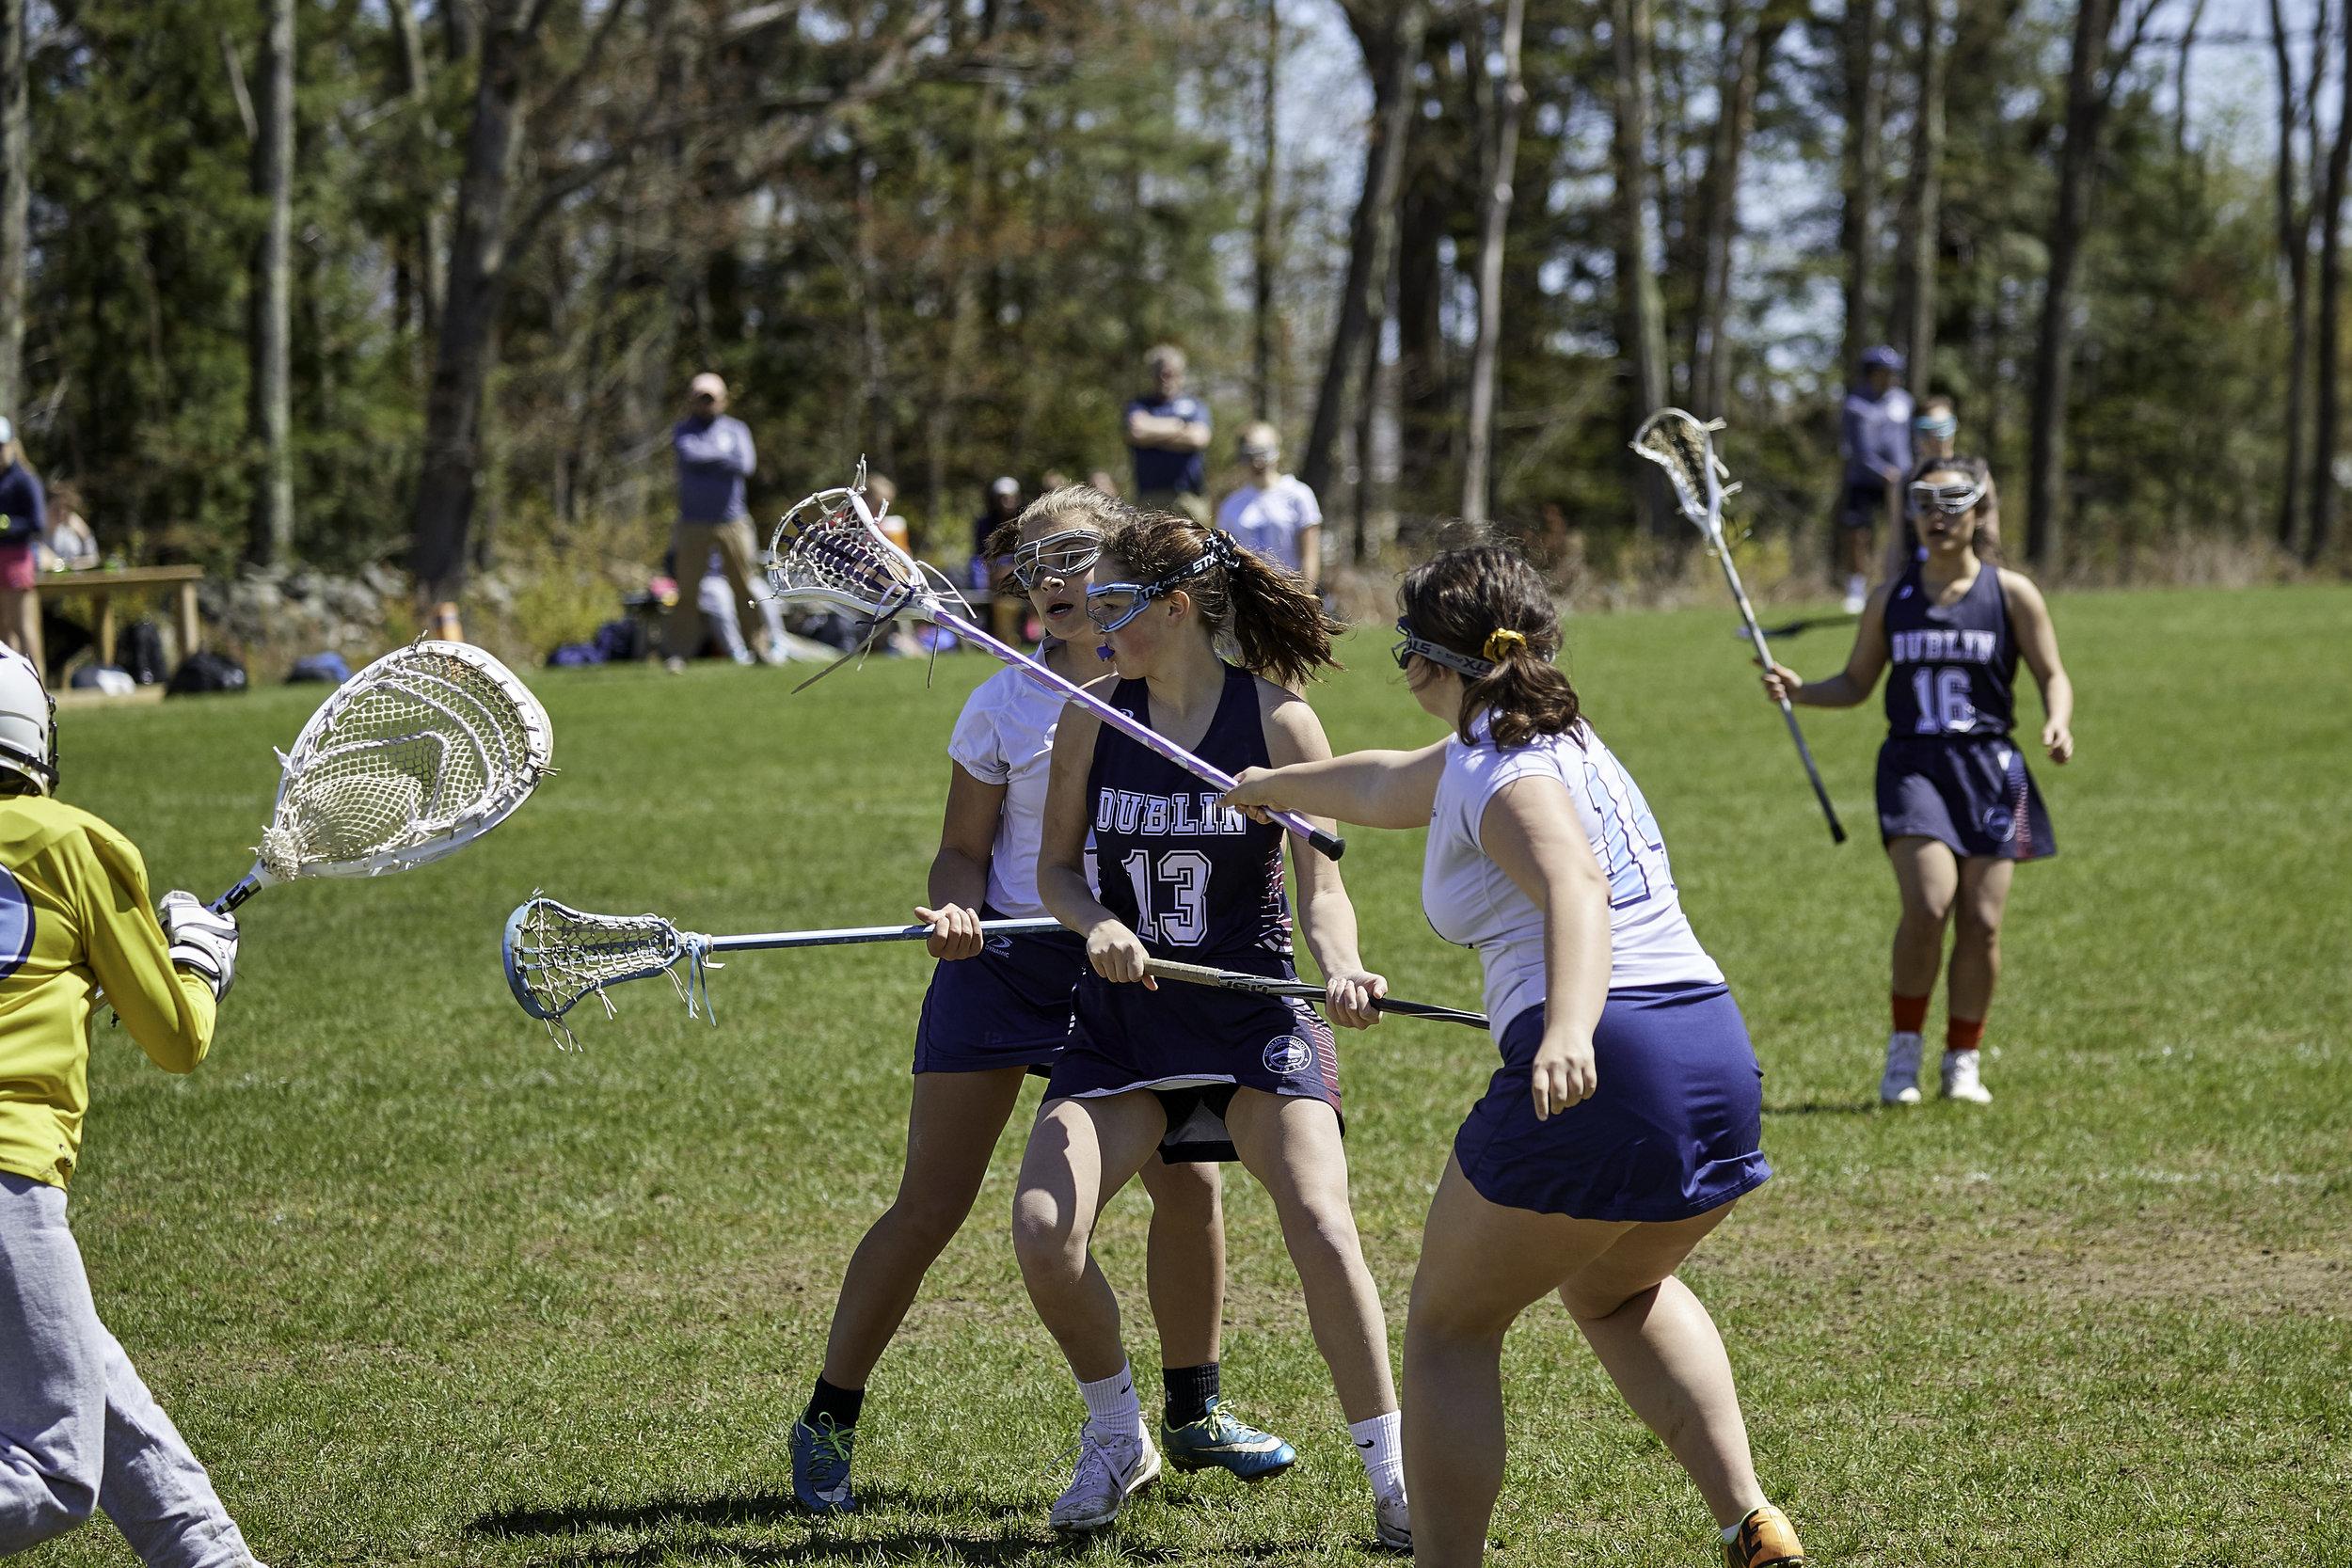 Girls Lacrosse vs. Stoneleigh Burnham School - May 11, 2019 - May 10, 2019193114.jpg